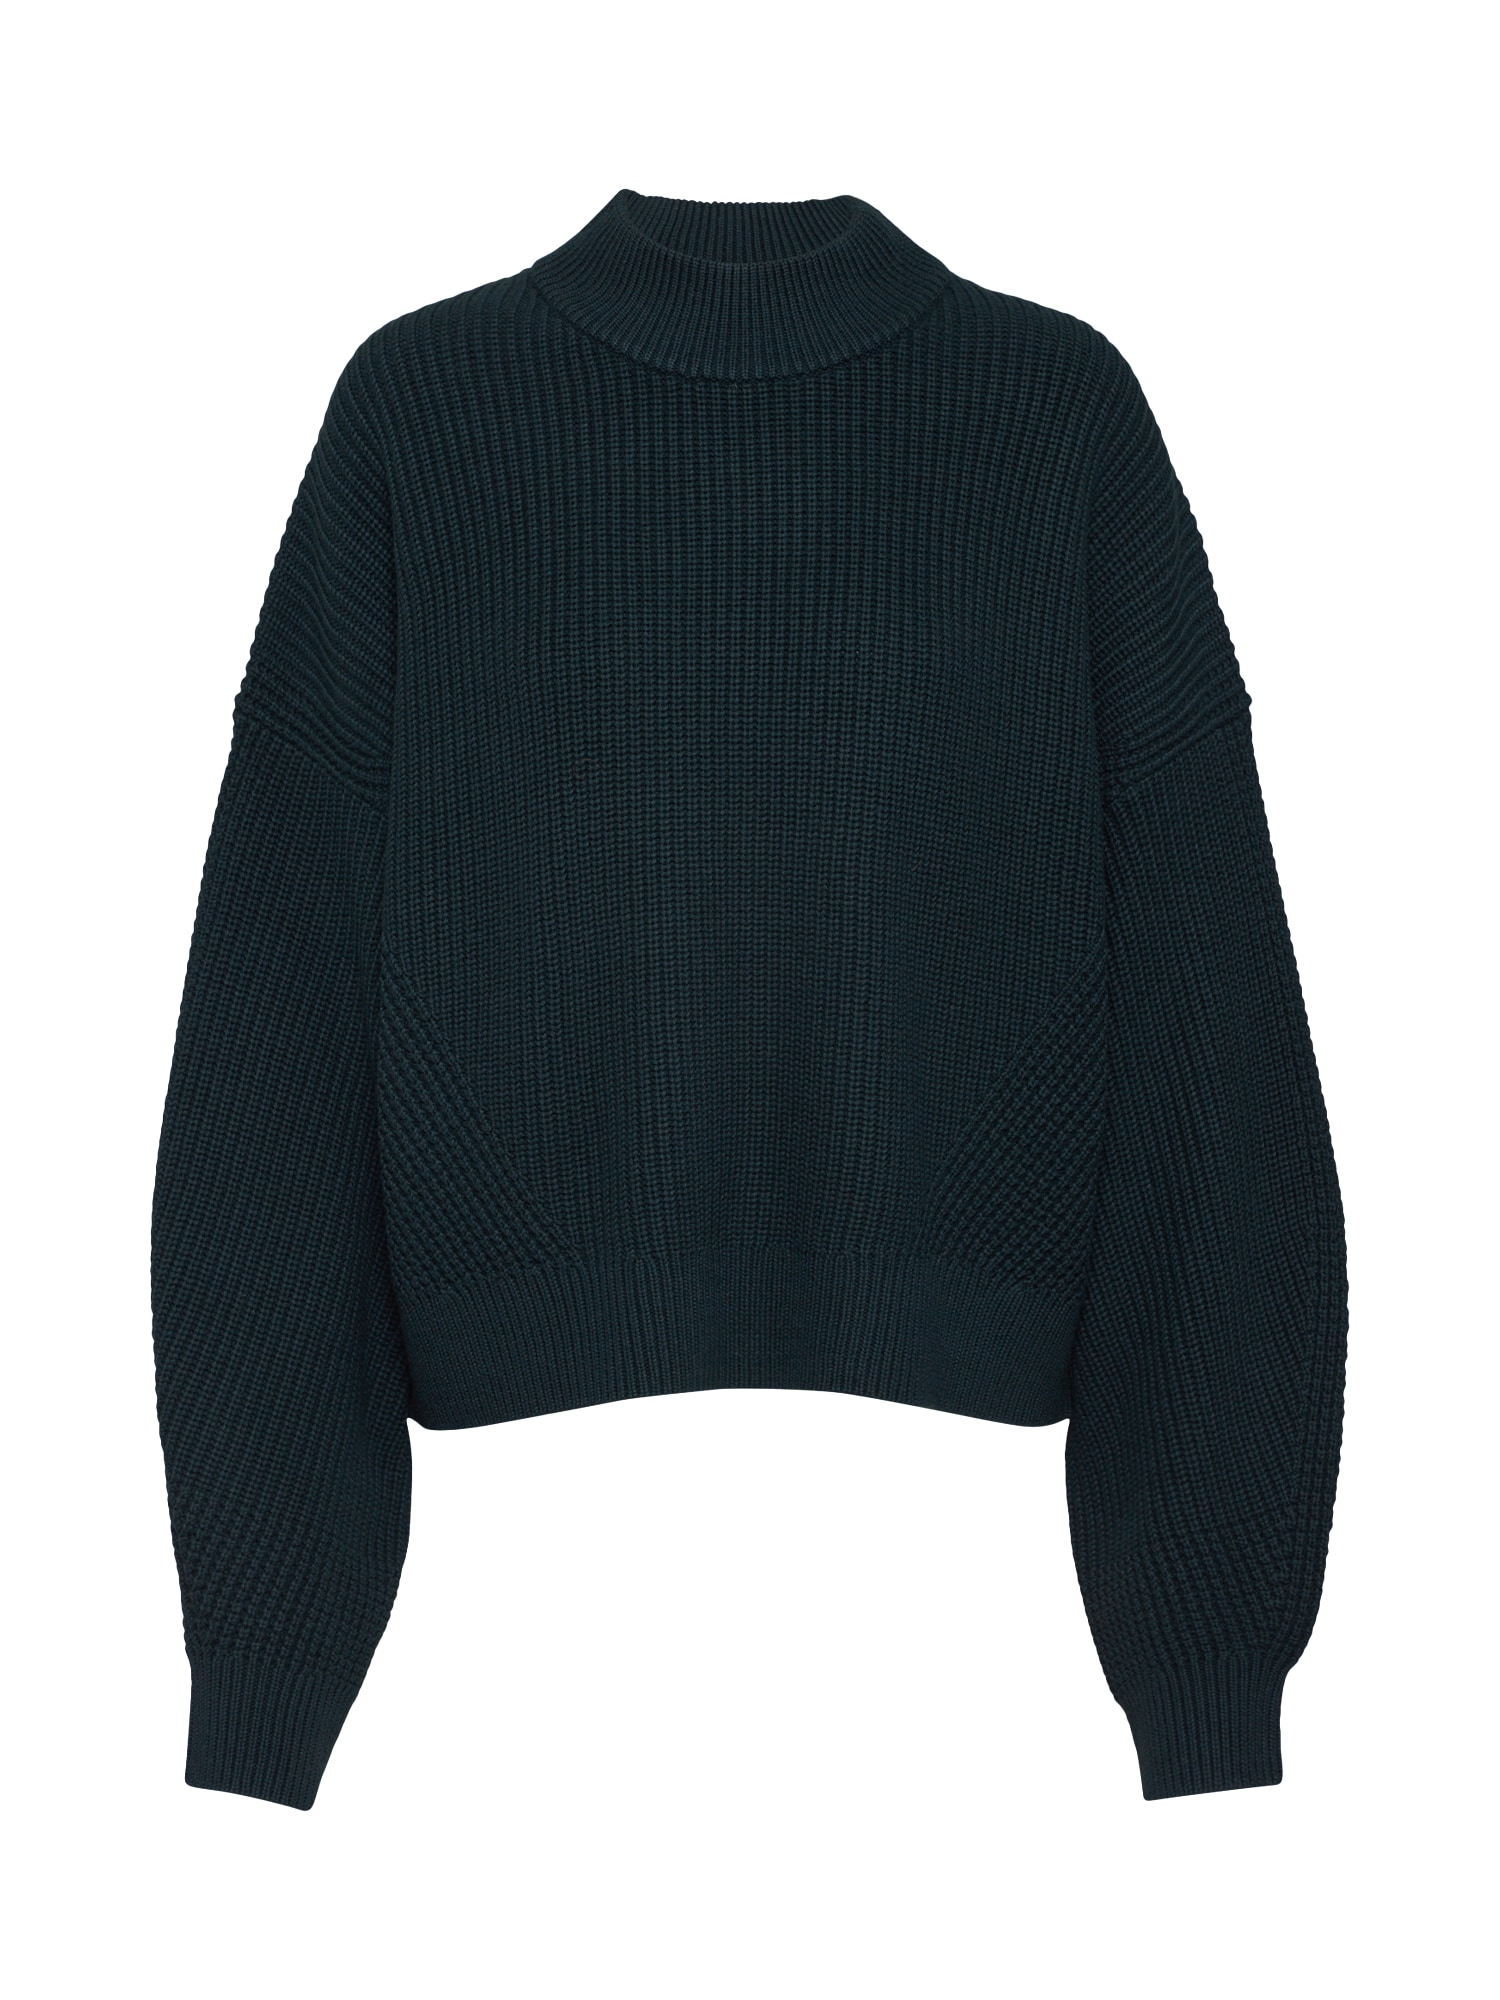 BOSS Megztinis 'Ismeni' tamsiai žalia